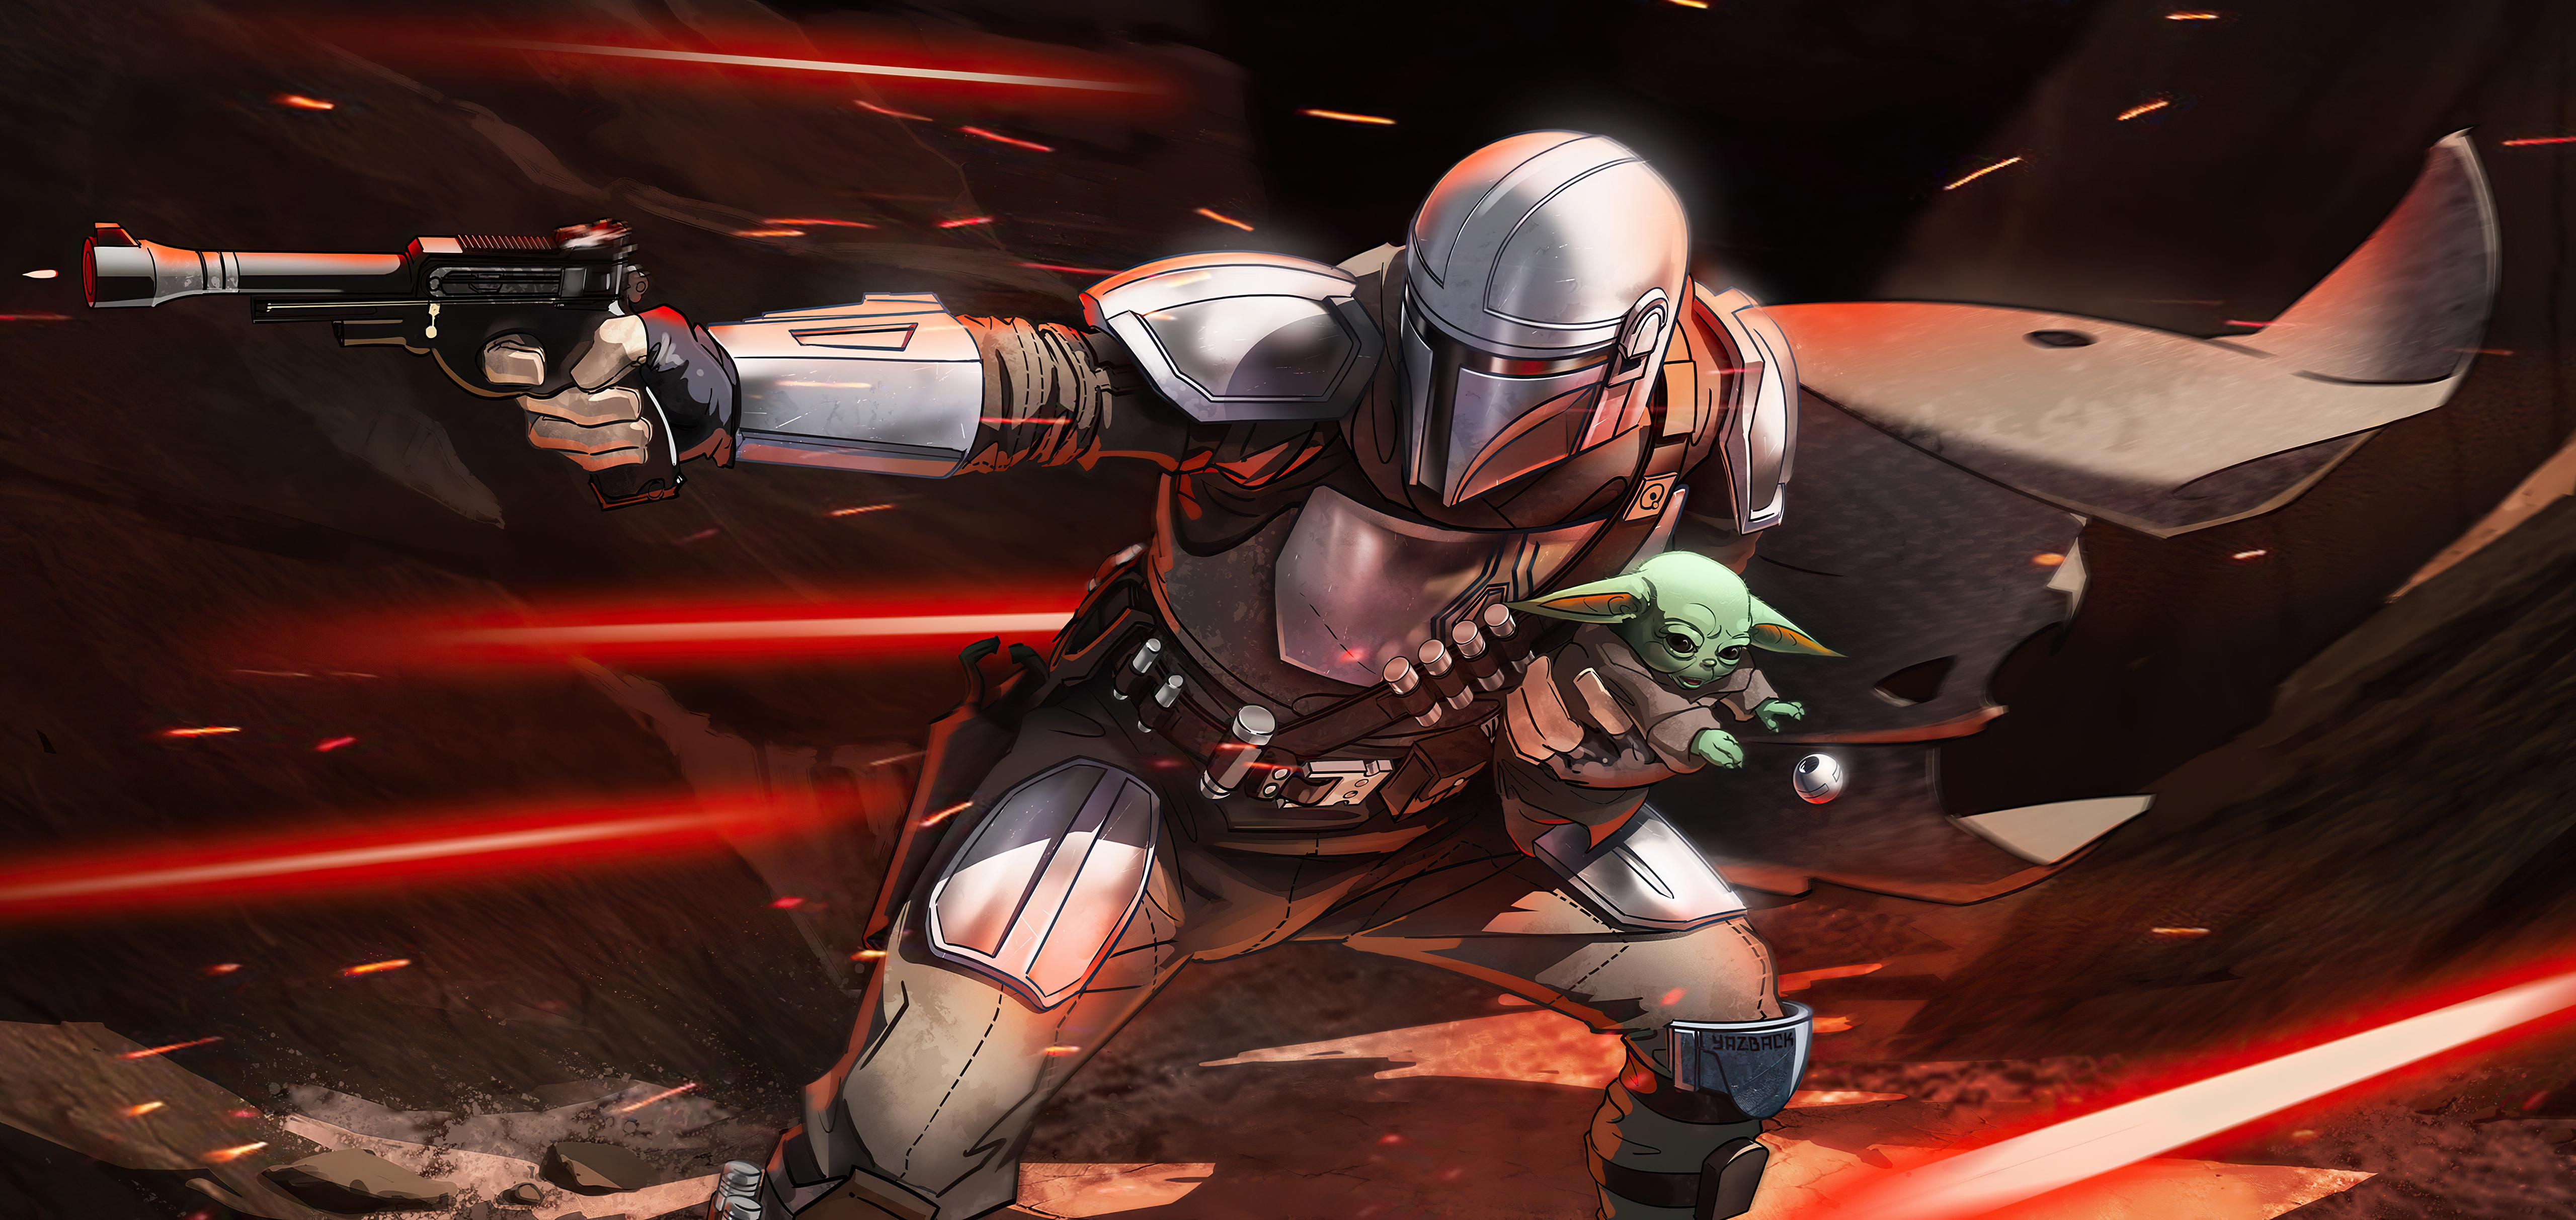 Star Wars Baby Yoda Grogu Star Wars The Mandalorian Character 5120x2425